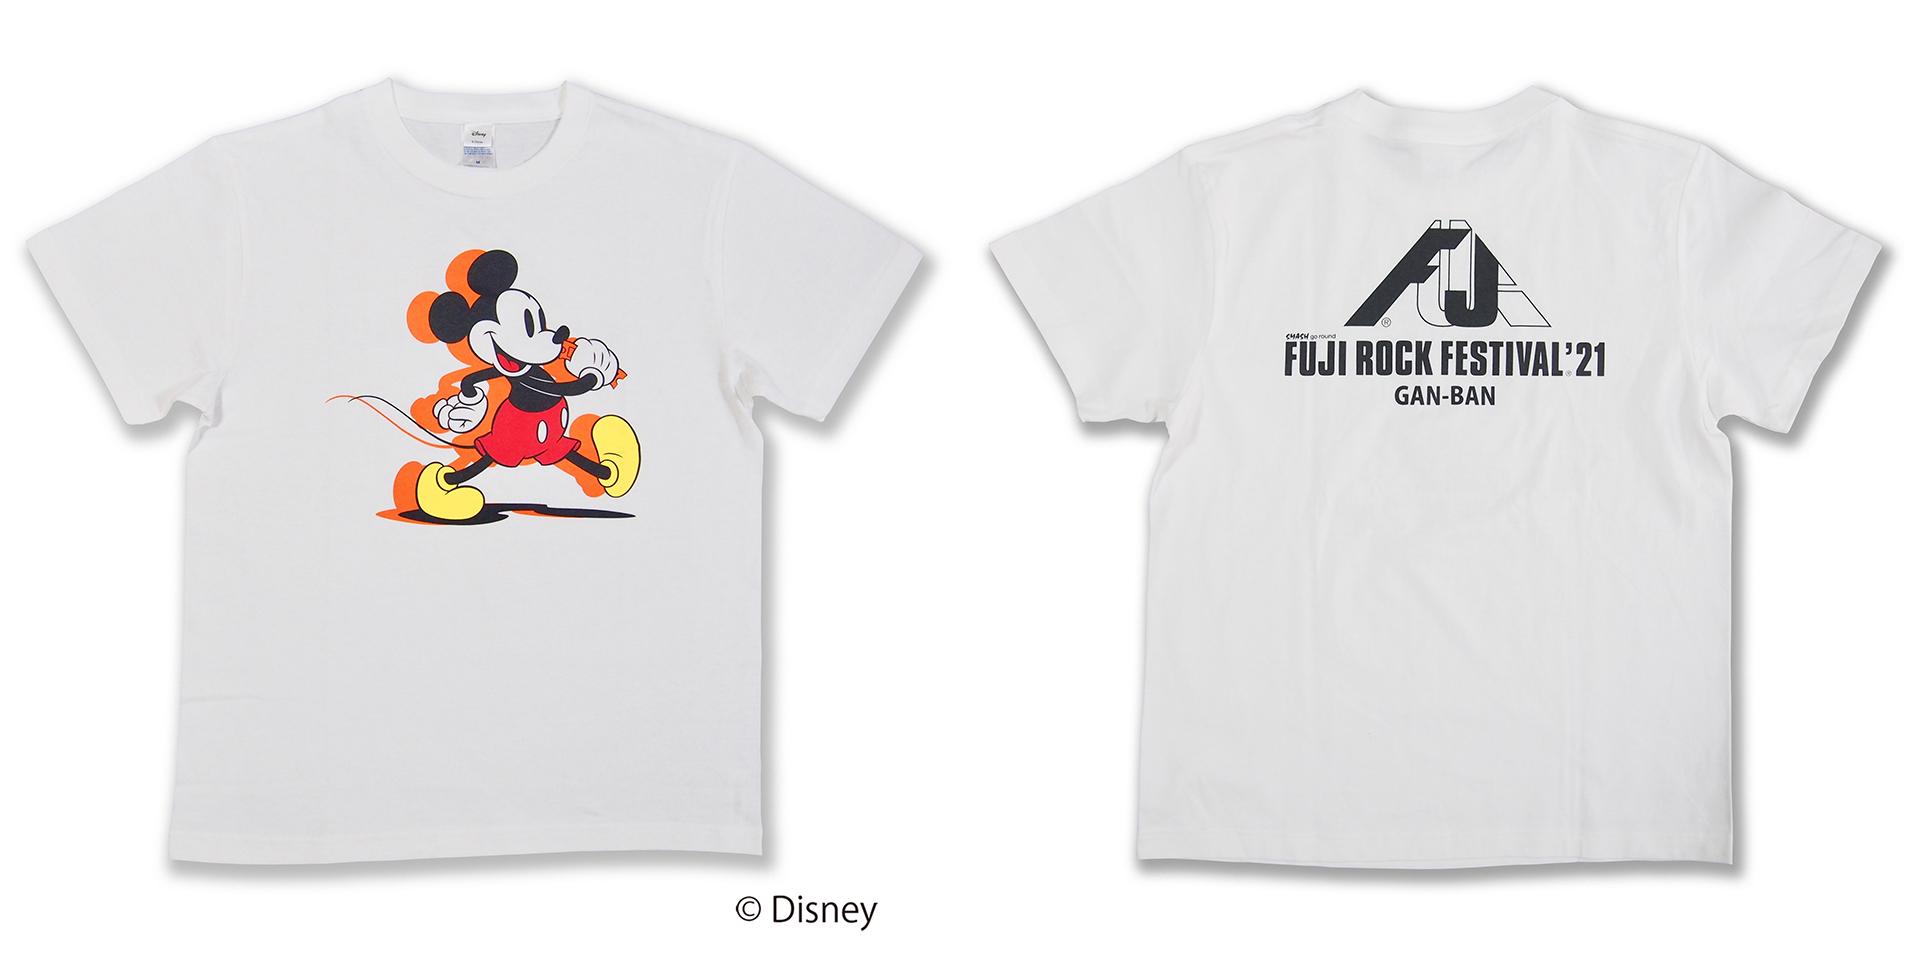 210521_news_ganbangood02_05 フジロック'21×GAN-BANコラボTシャツが一挙発売!人気キャラクターが勢揃い #fujirock